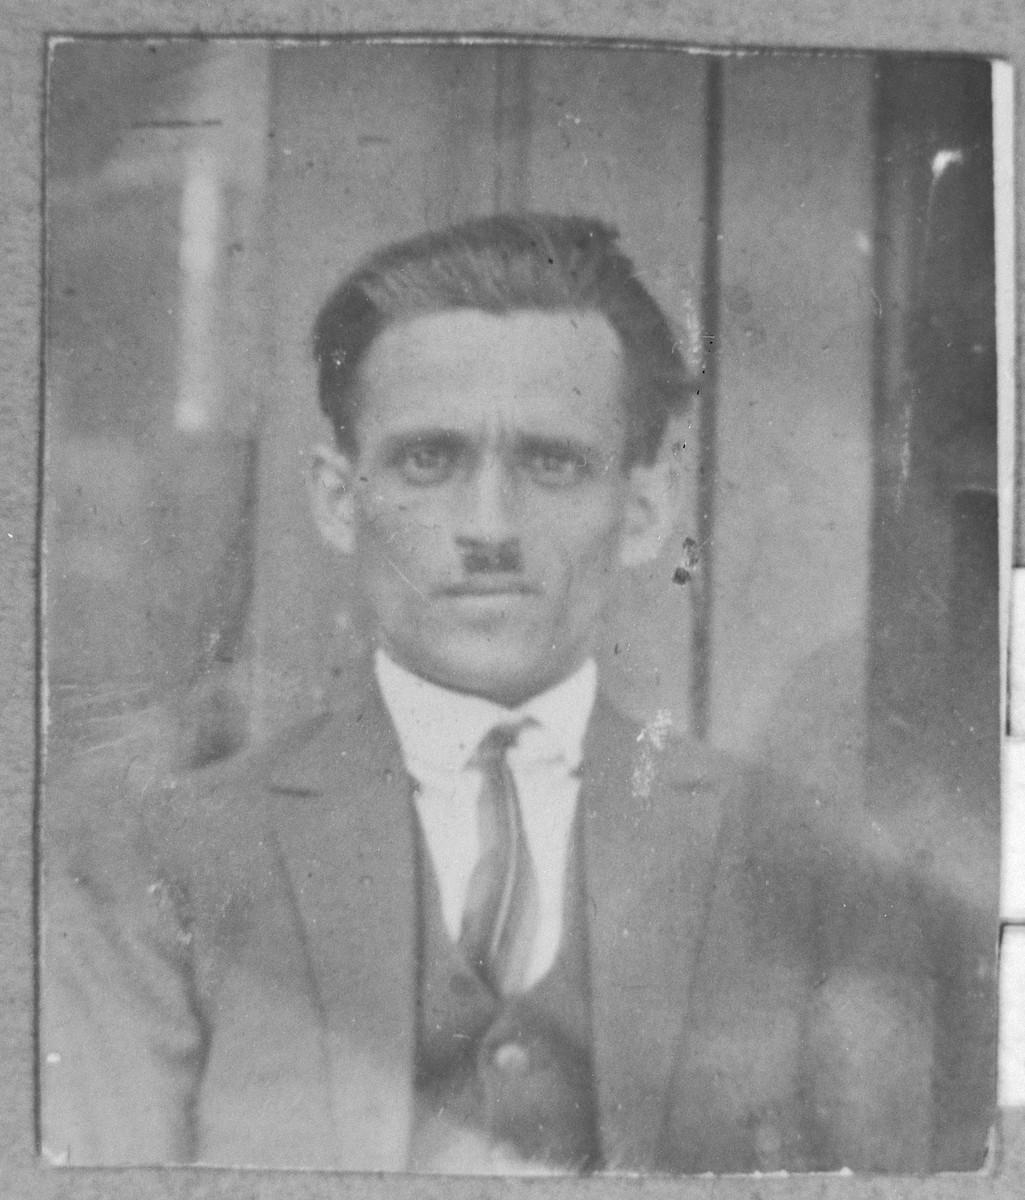 Portrait of Eliau Pardo (from Skopje), son of Bohor Pardo.